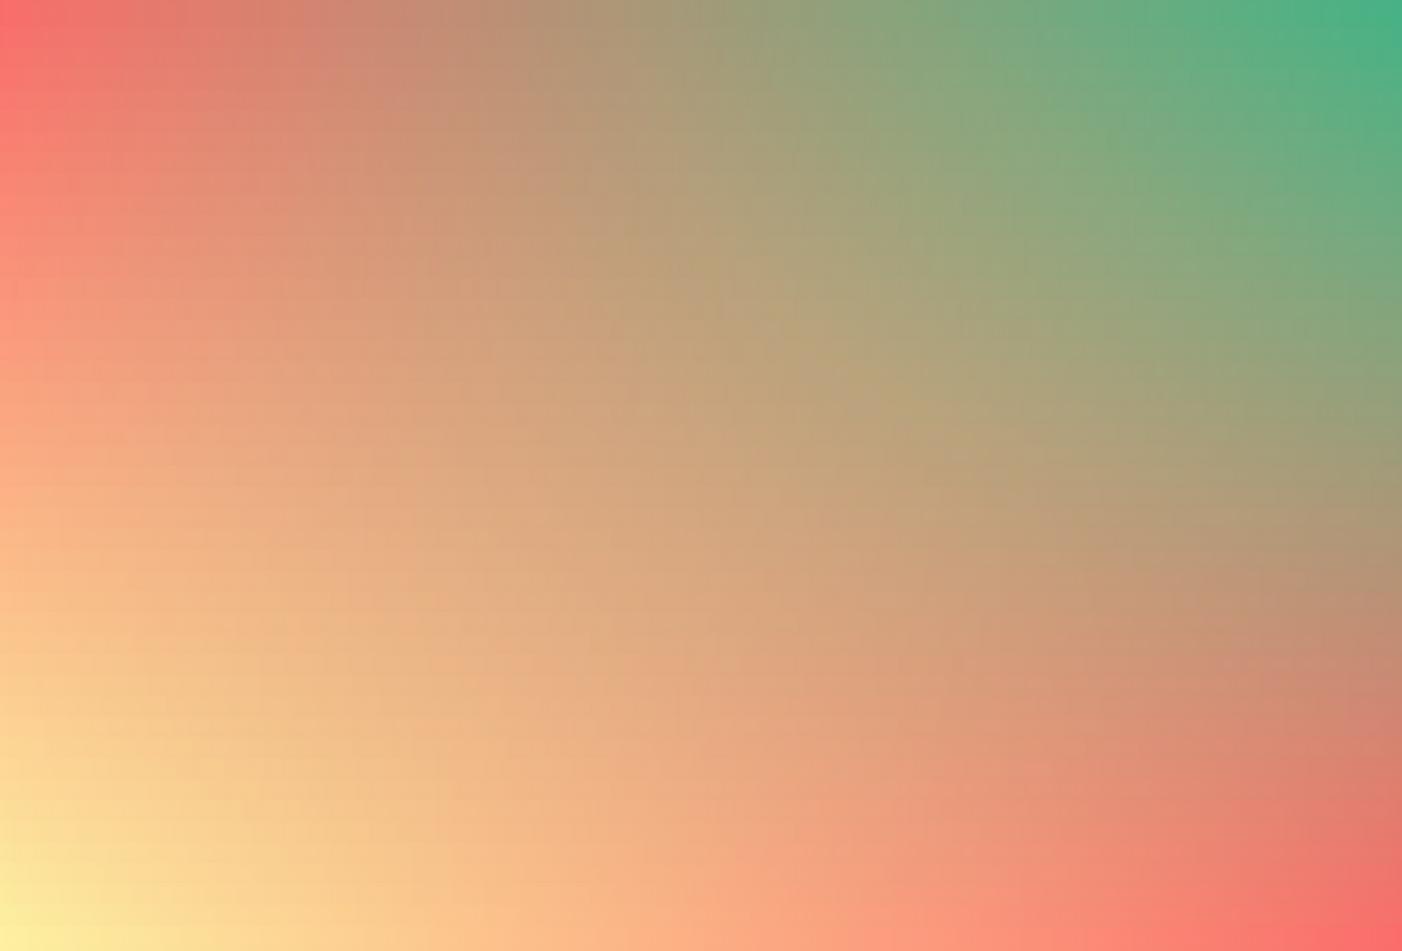 MD__Portfolio__BAF2019_ㅍ_copy_2.png